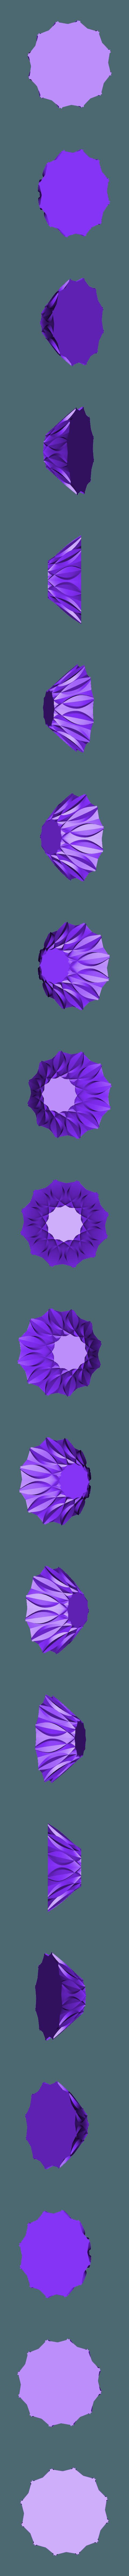 retro vase 2.stl Download free STL file Retro bowl • 3D printing template, Brithawkes